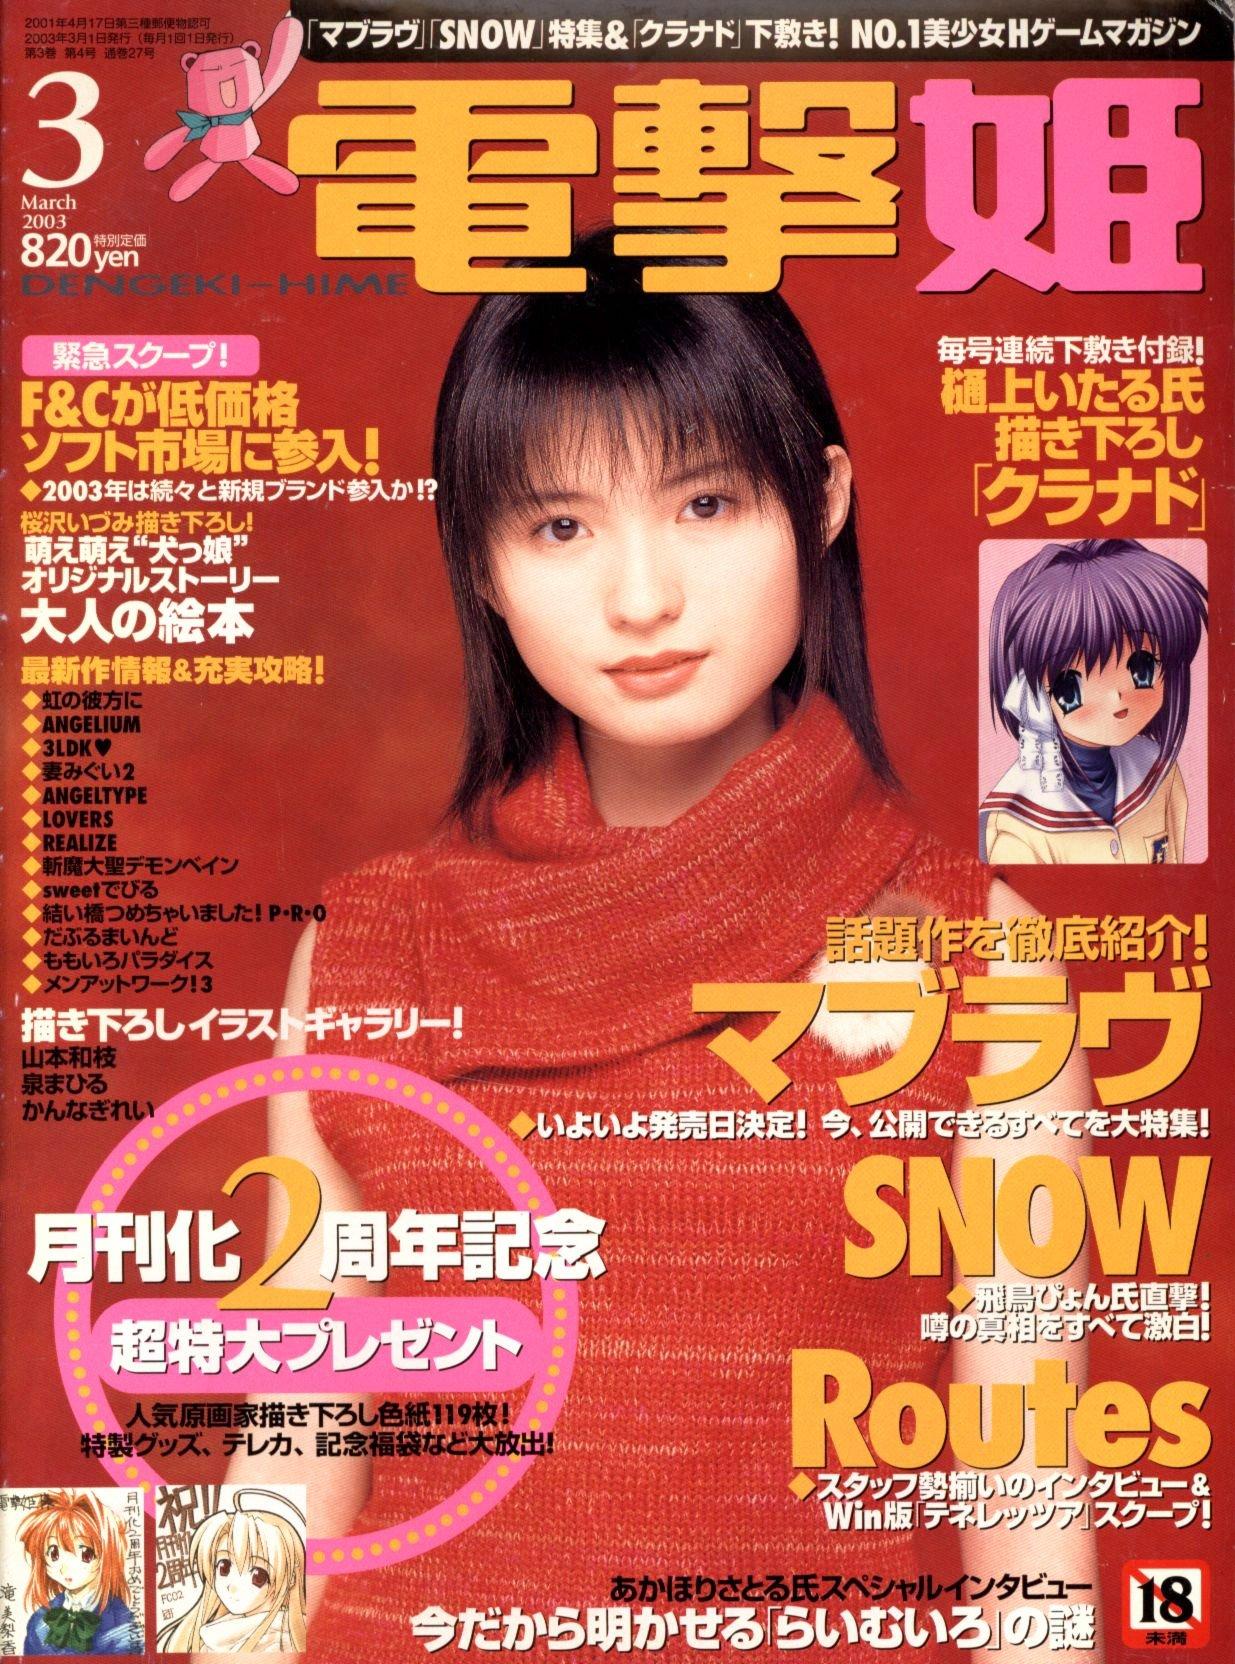 Dengeki Hime Issue 036 (March 2003)